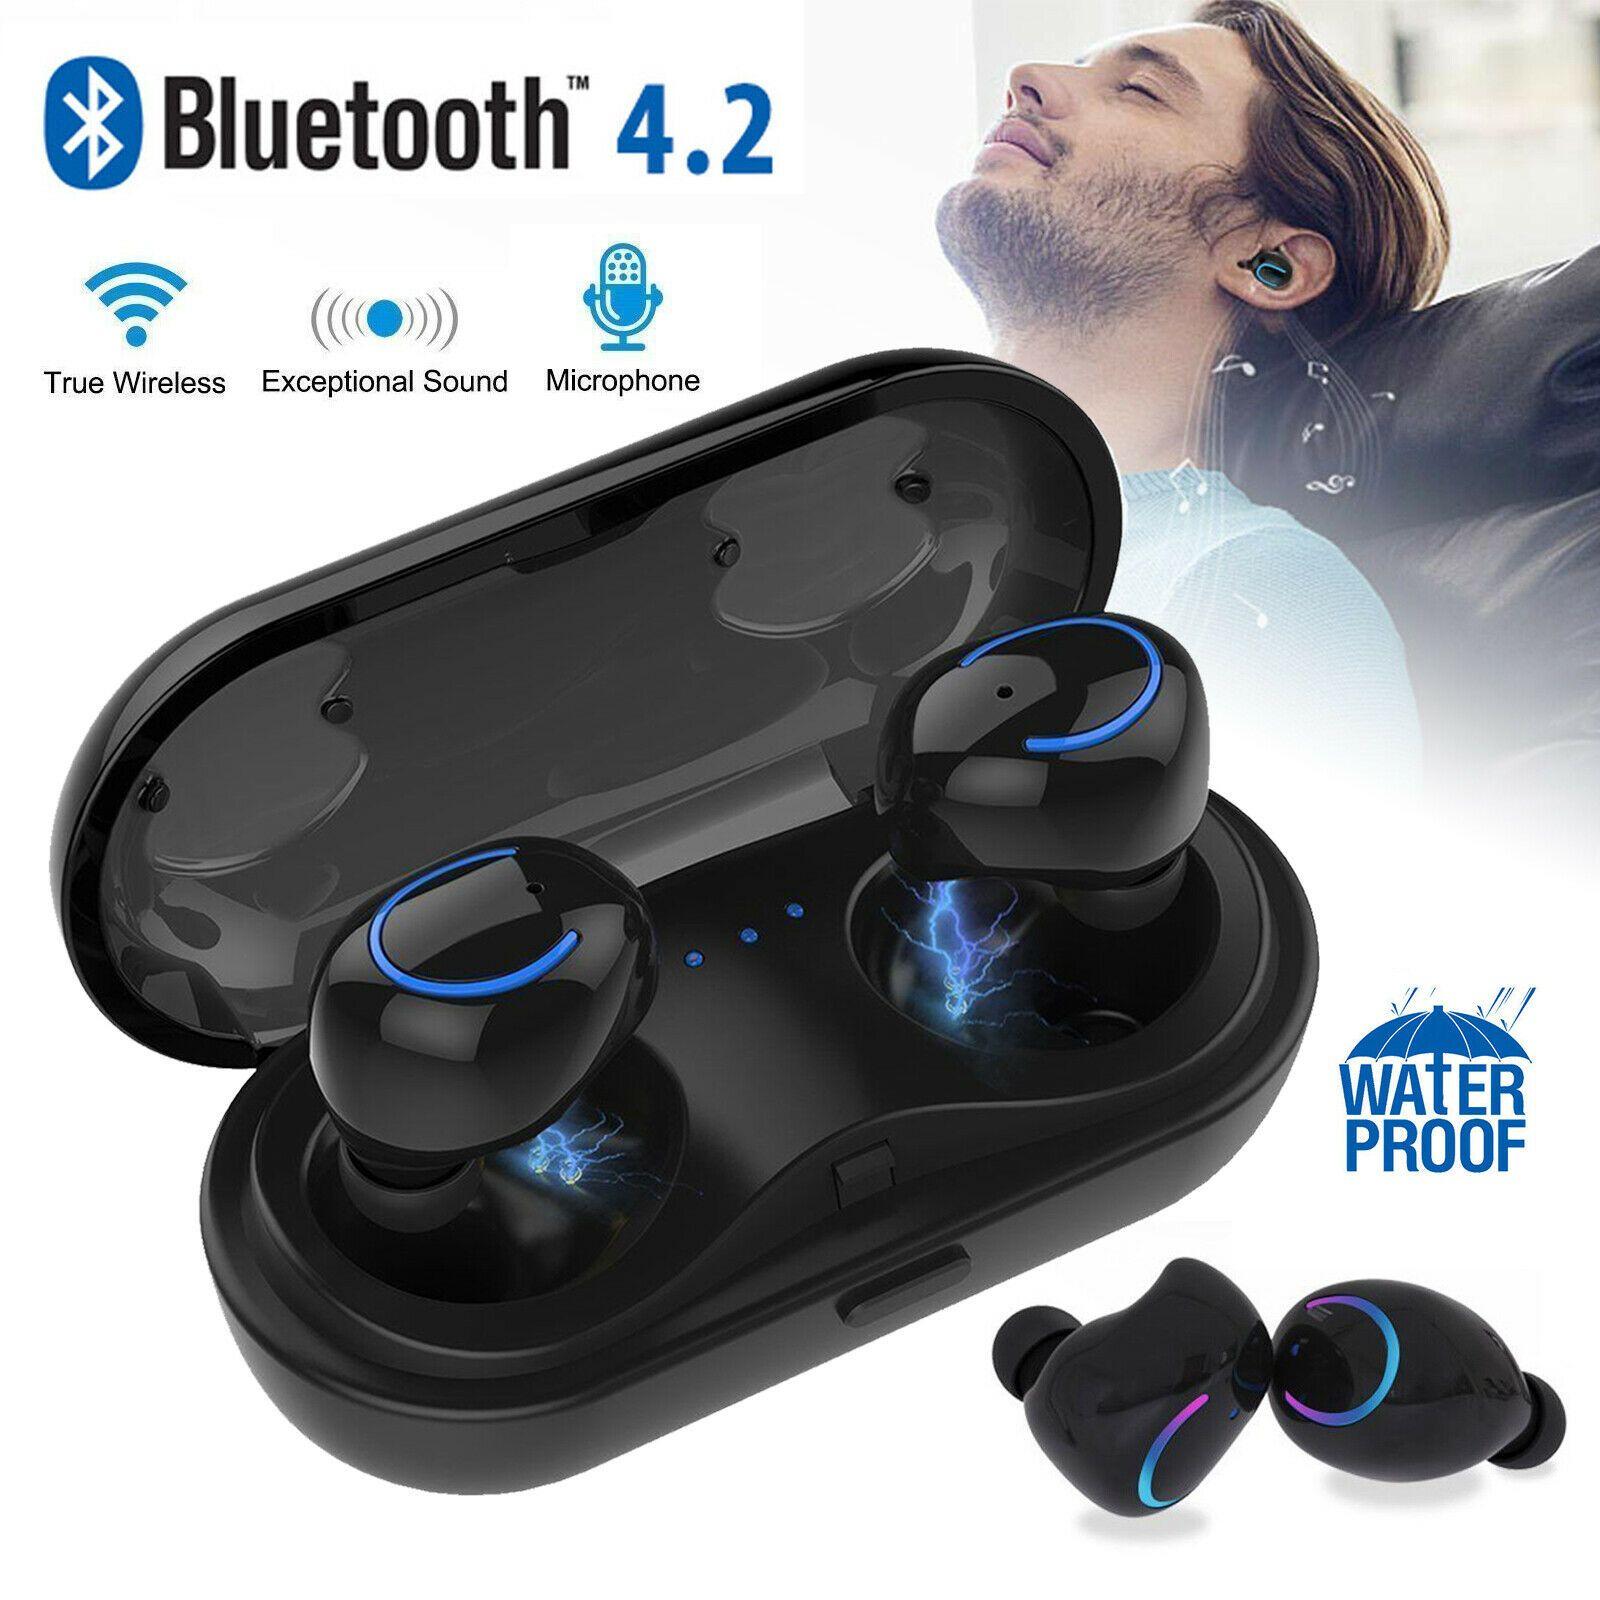 Wireless Earbuds Bluetooth Earphones Headphones For Samsung Galaxy S8 S9 Note 89 Price 24 97 Iphone App Wireless Earbuds Iphone Headphones Headphones